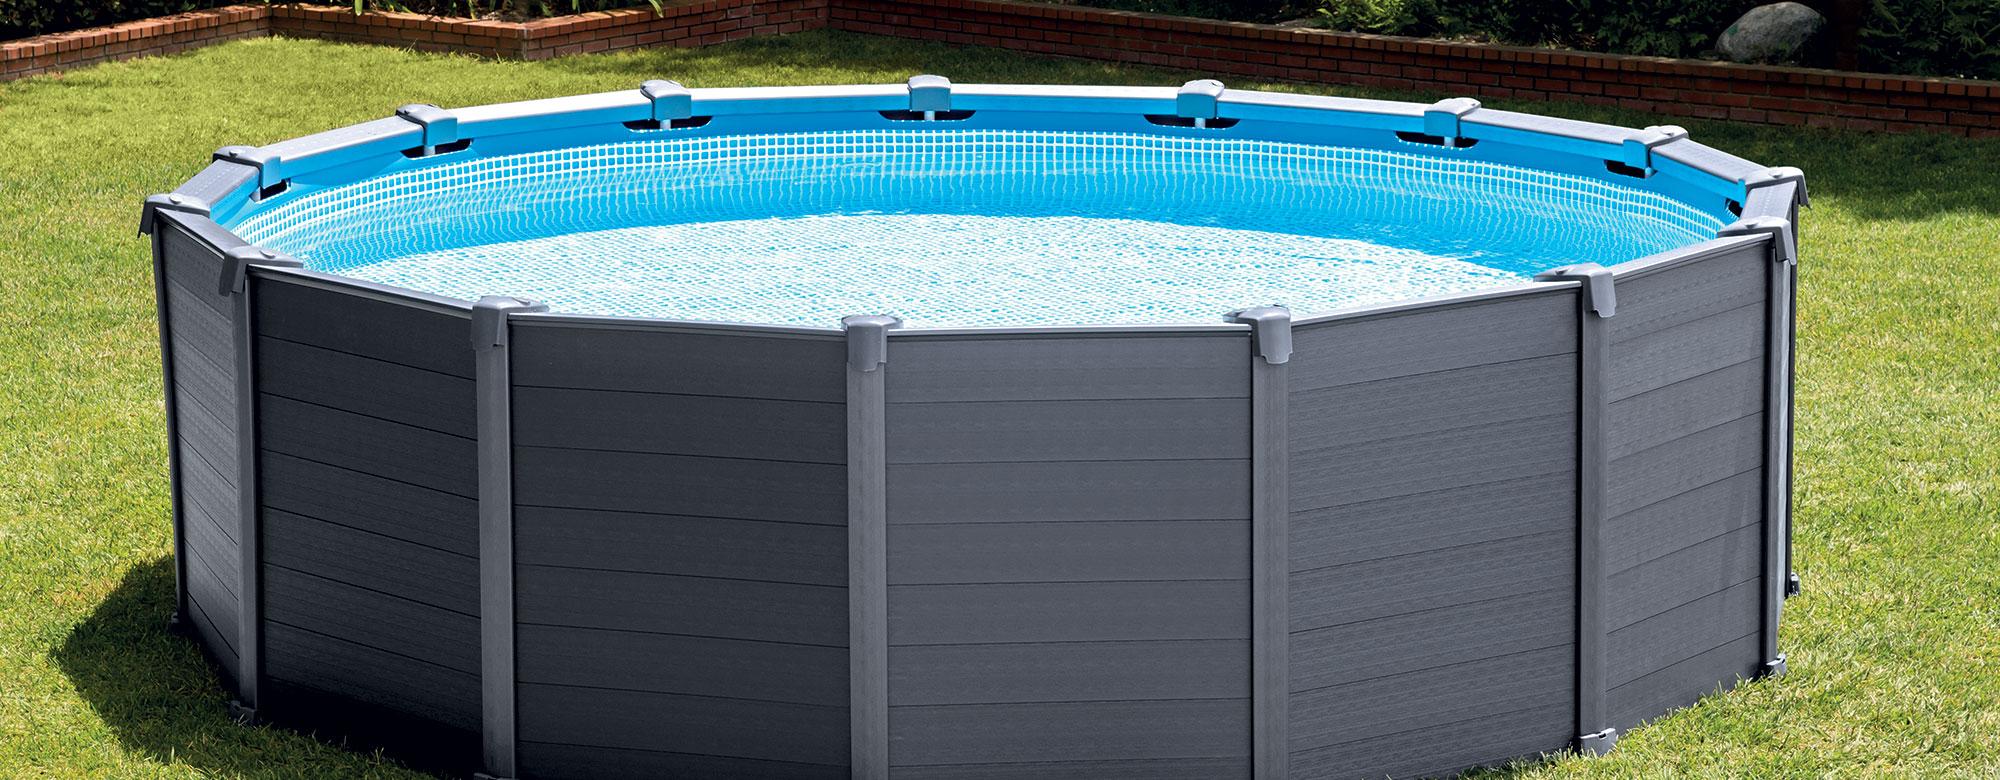 Piscine Tubulaire Habillage Bois maison maison design: piscine intex graphite habillage pvc